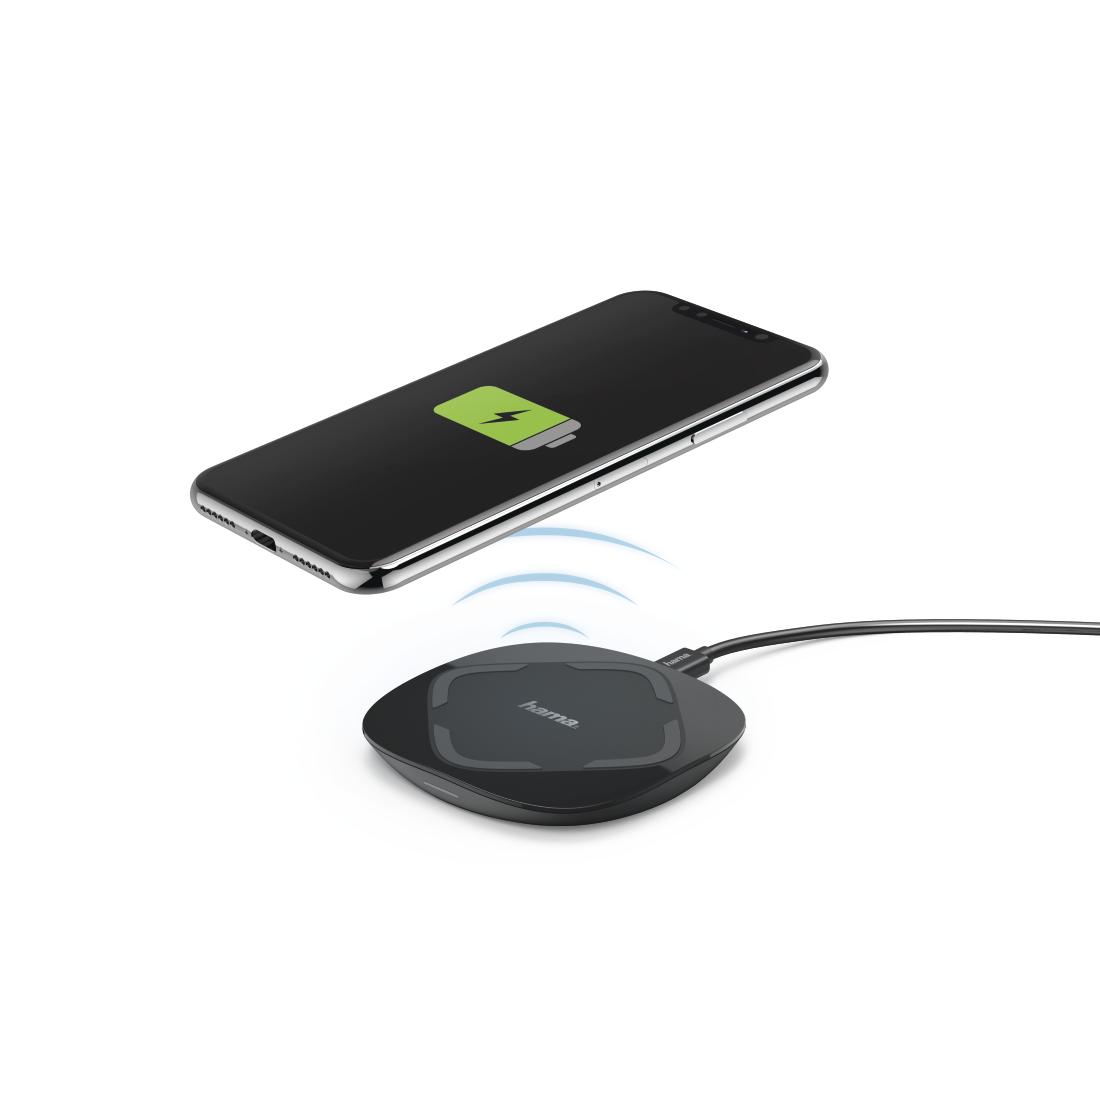 00183375 hama qi fc 10 wireless charger black hama de. Black Bedroom Furniture Sets. Home Design Ideas